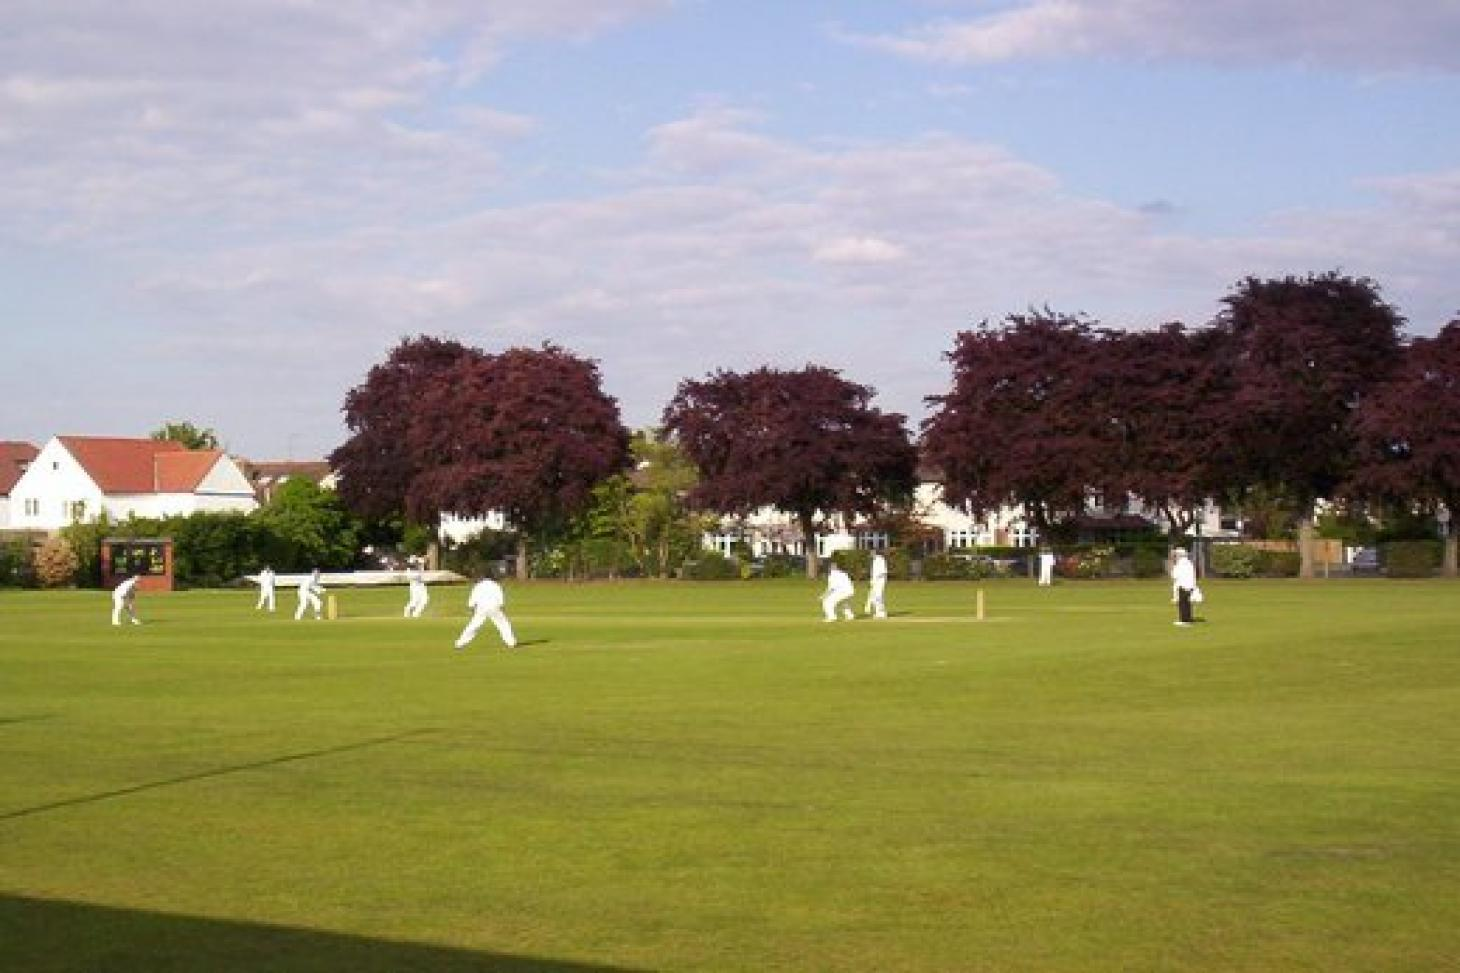 Barnes Sports Club Nets | Artificial cricket facilities